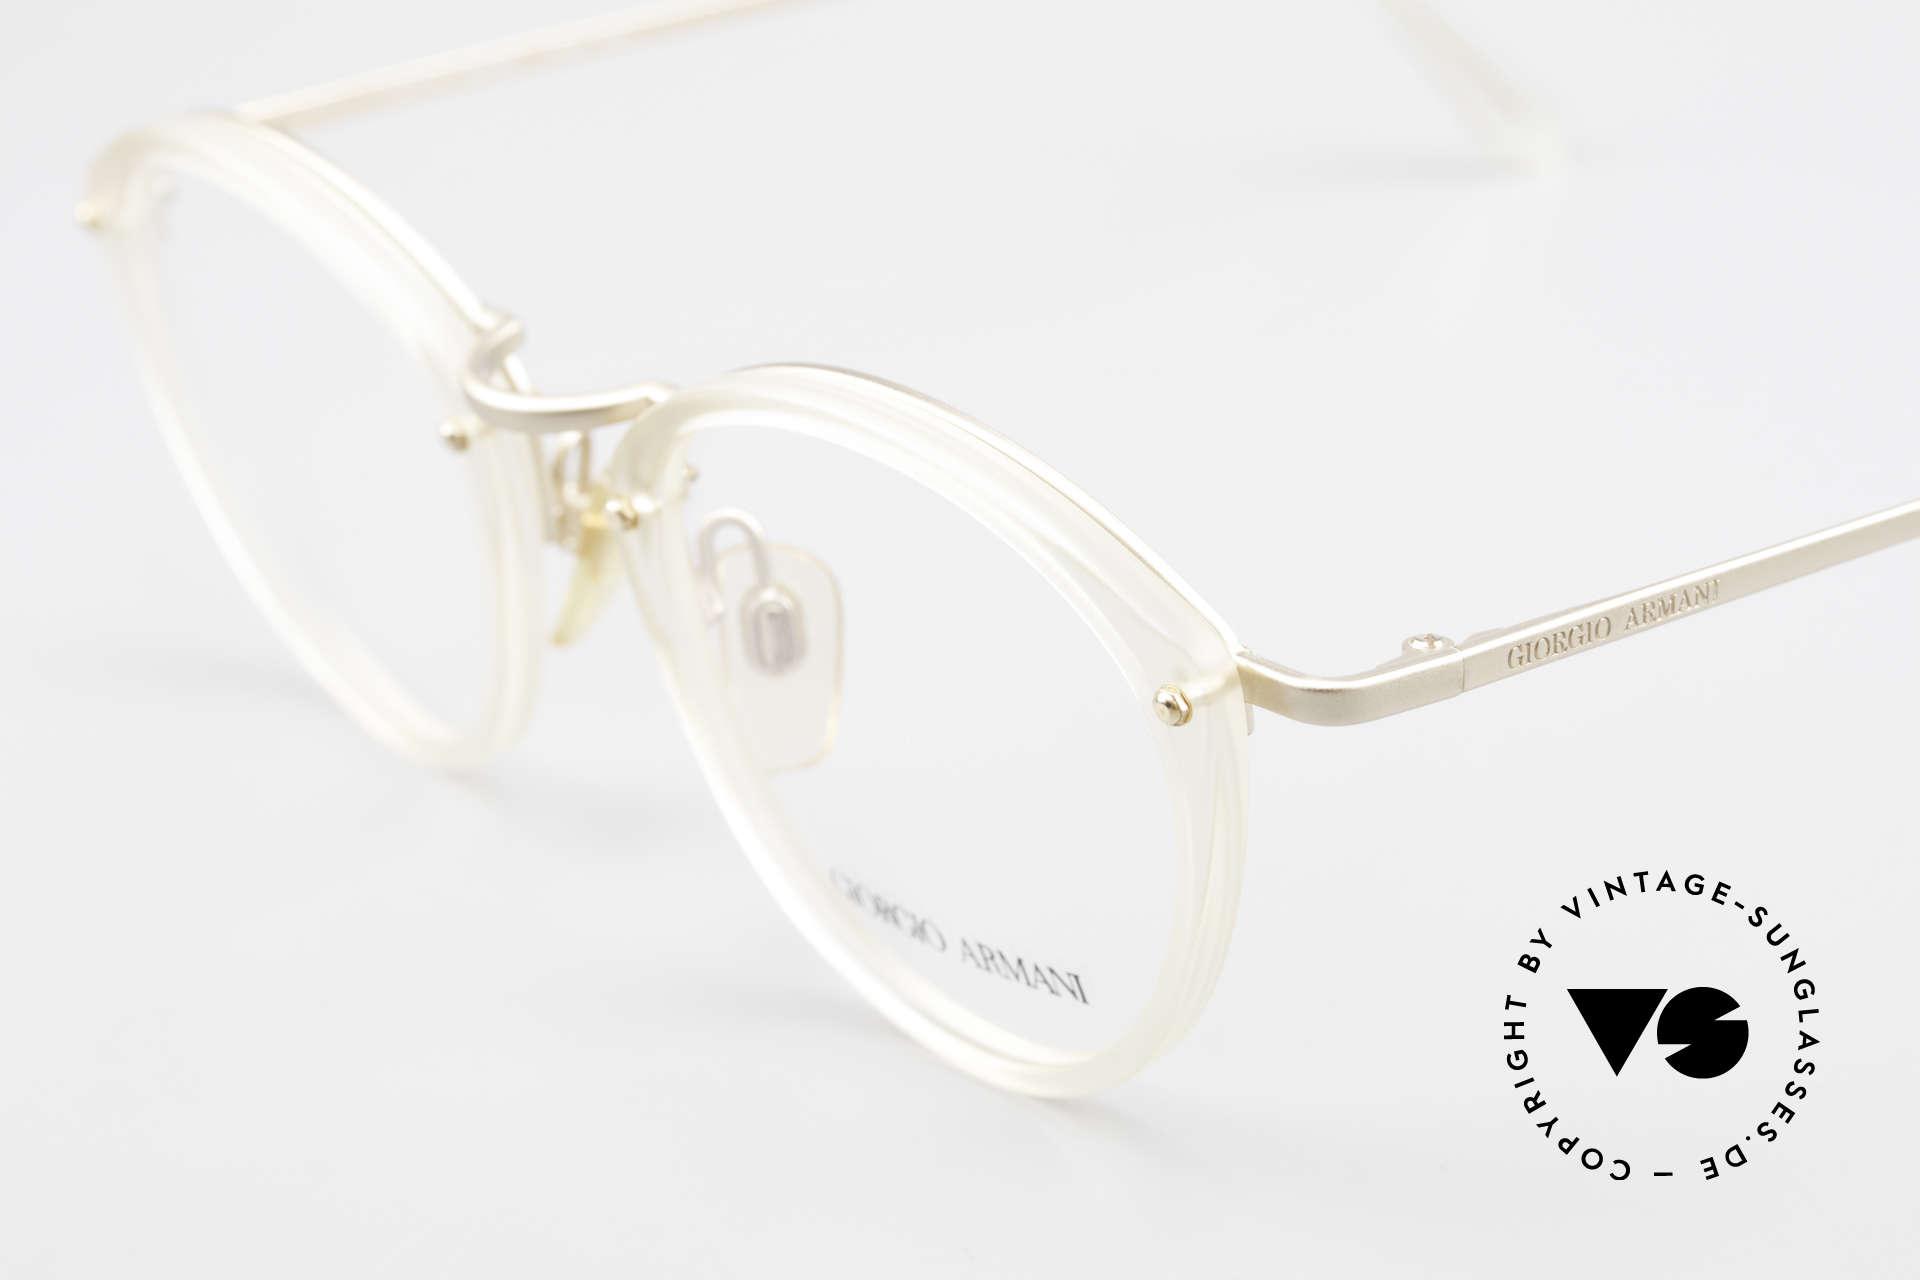 Giorgio Armani 354 80s Designer Glasses Vintage, NO RETRO glasses, but a genuine 30 years old original, Made for Men and Women